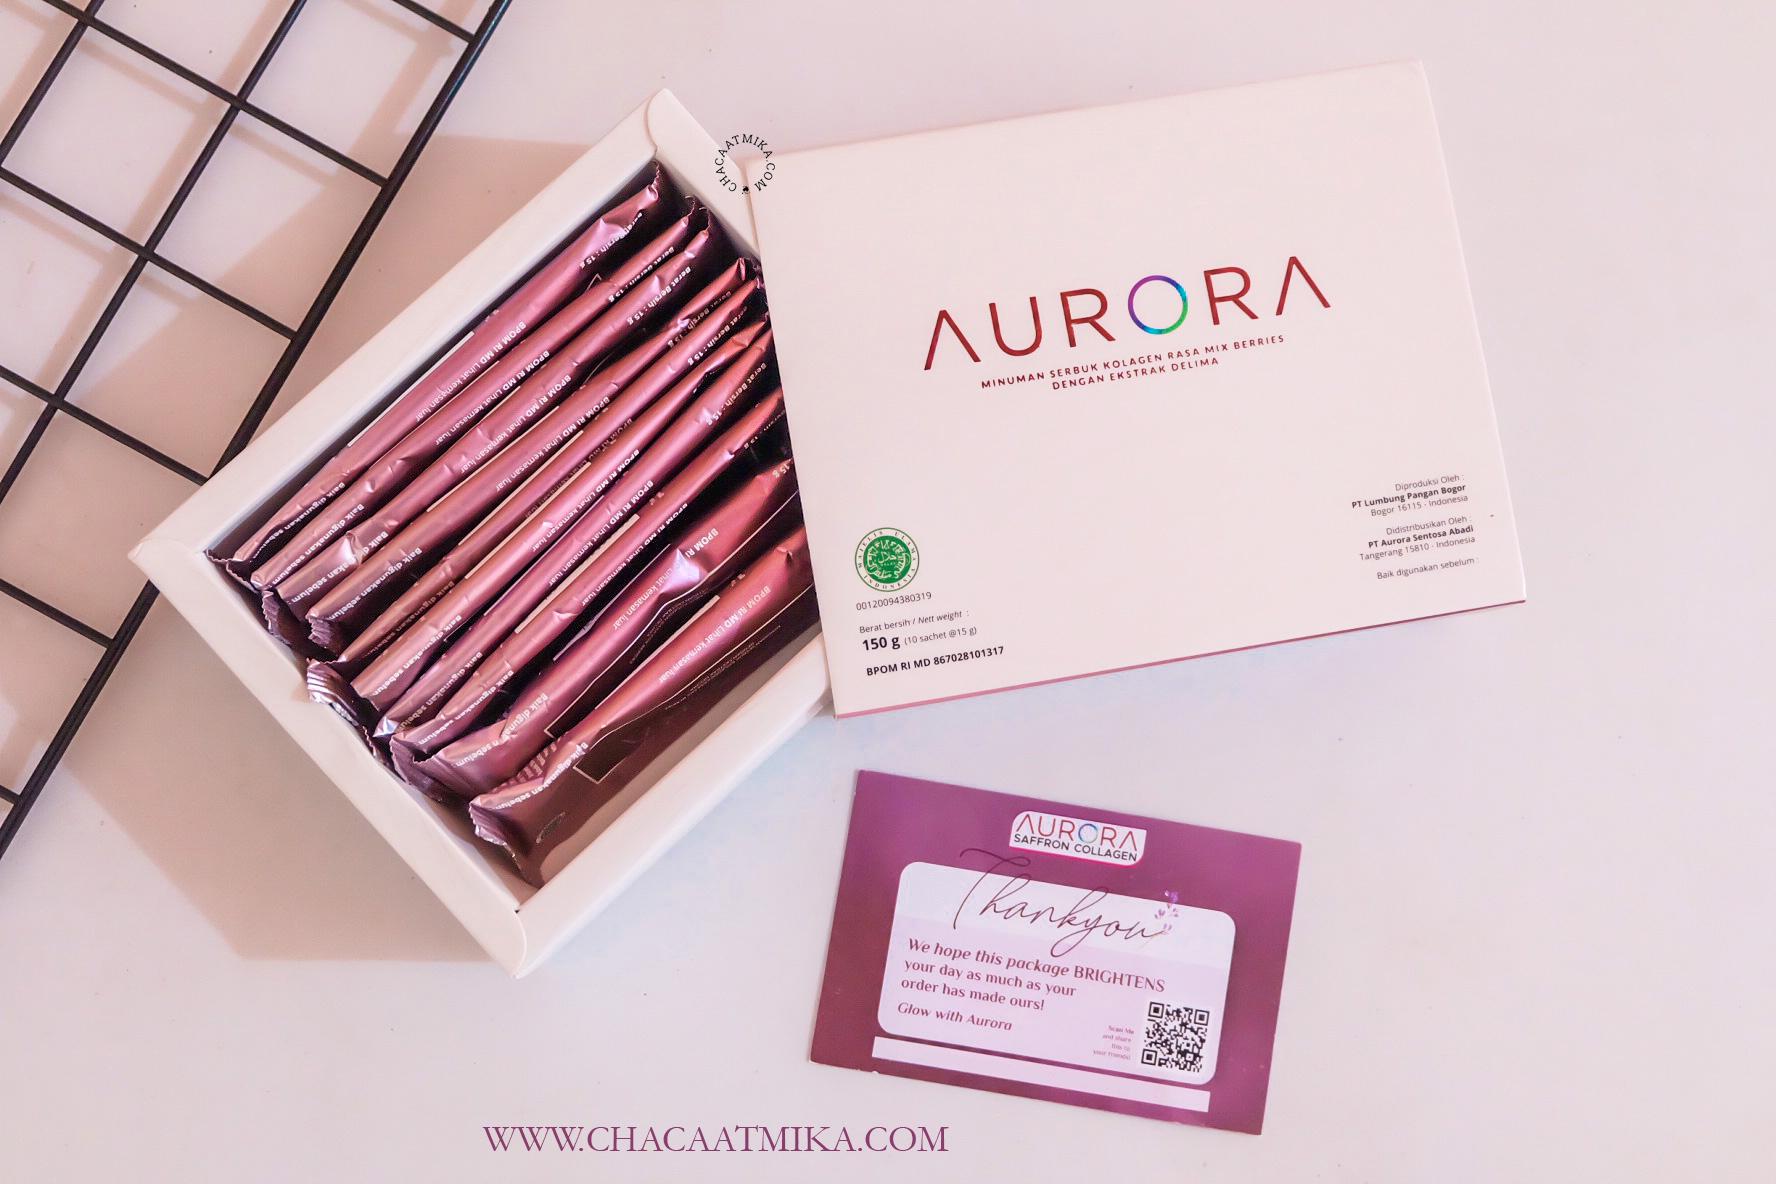 [Review] Aurora Saffron Collagen, Minuman Serbuk Kolagen Ber-Saffron Pertama di Dunia